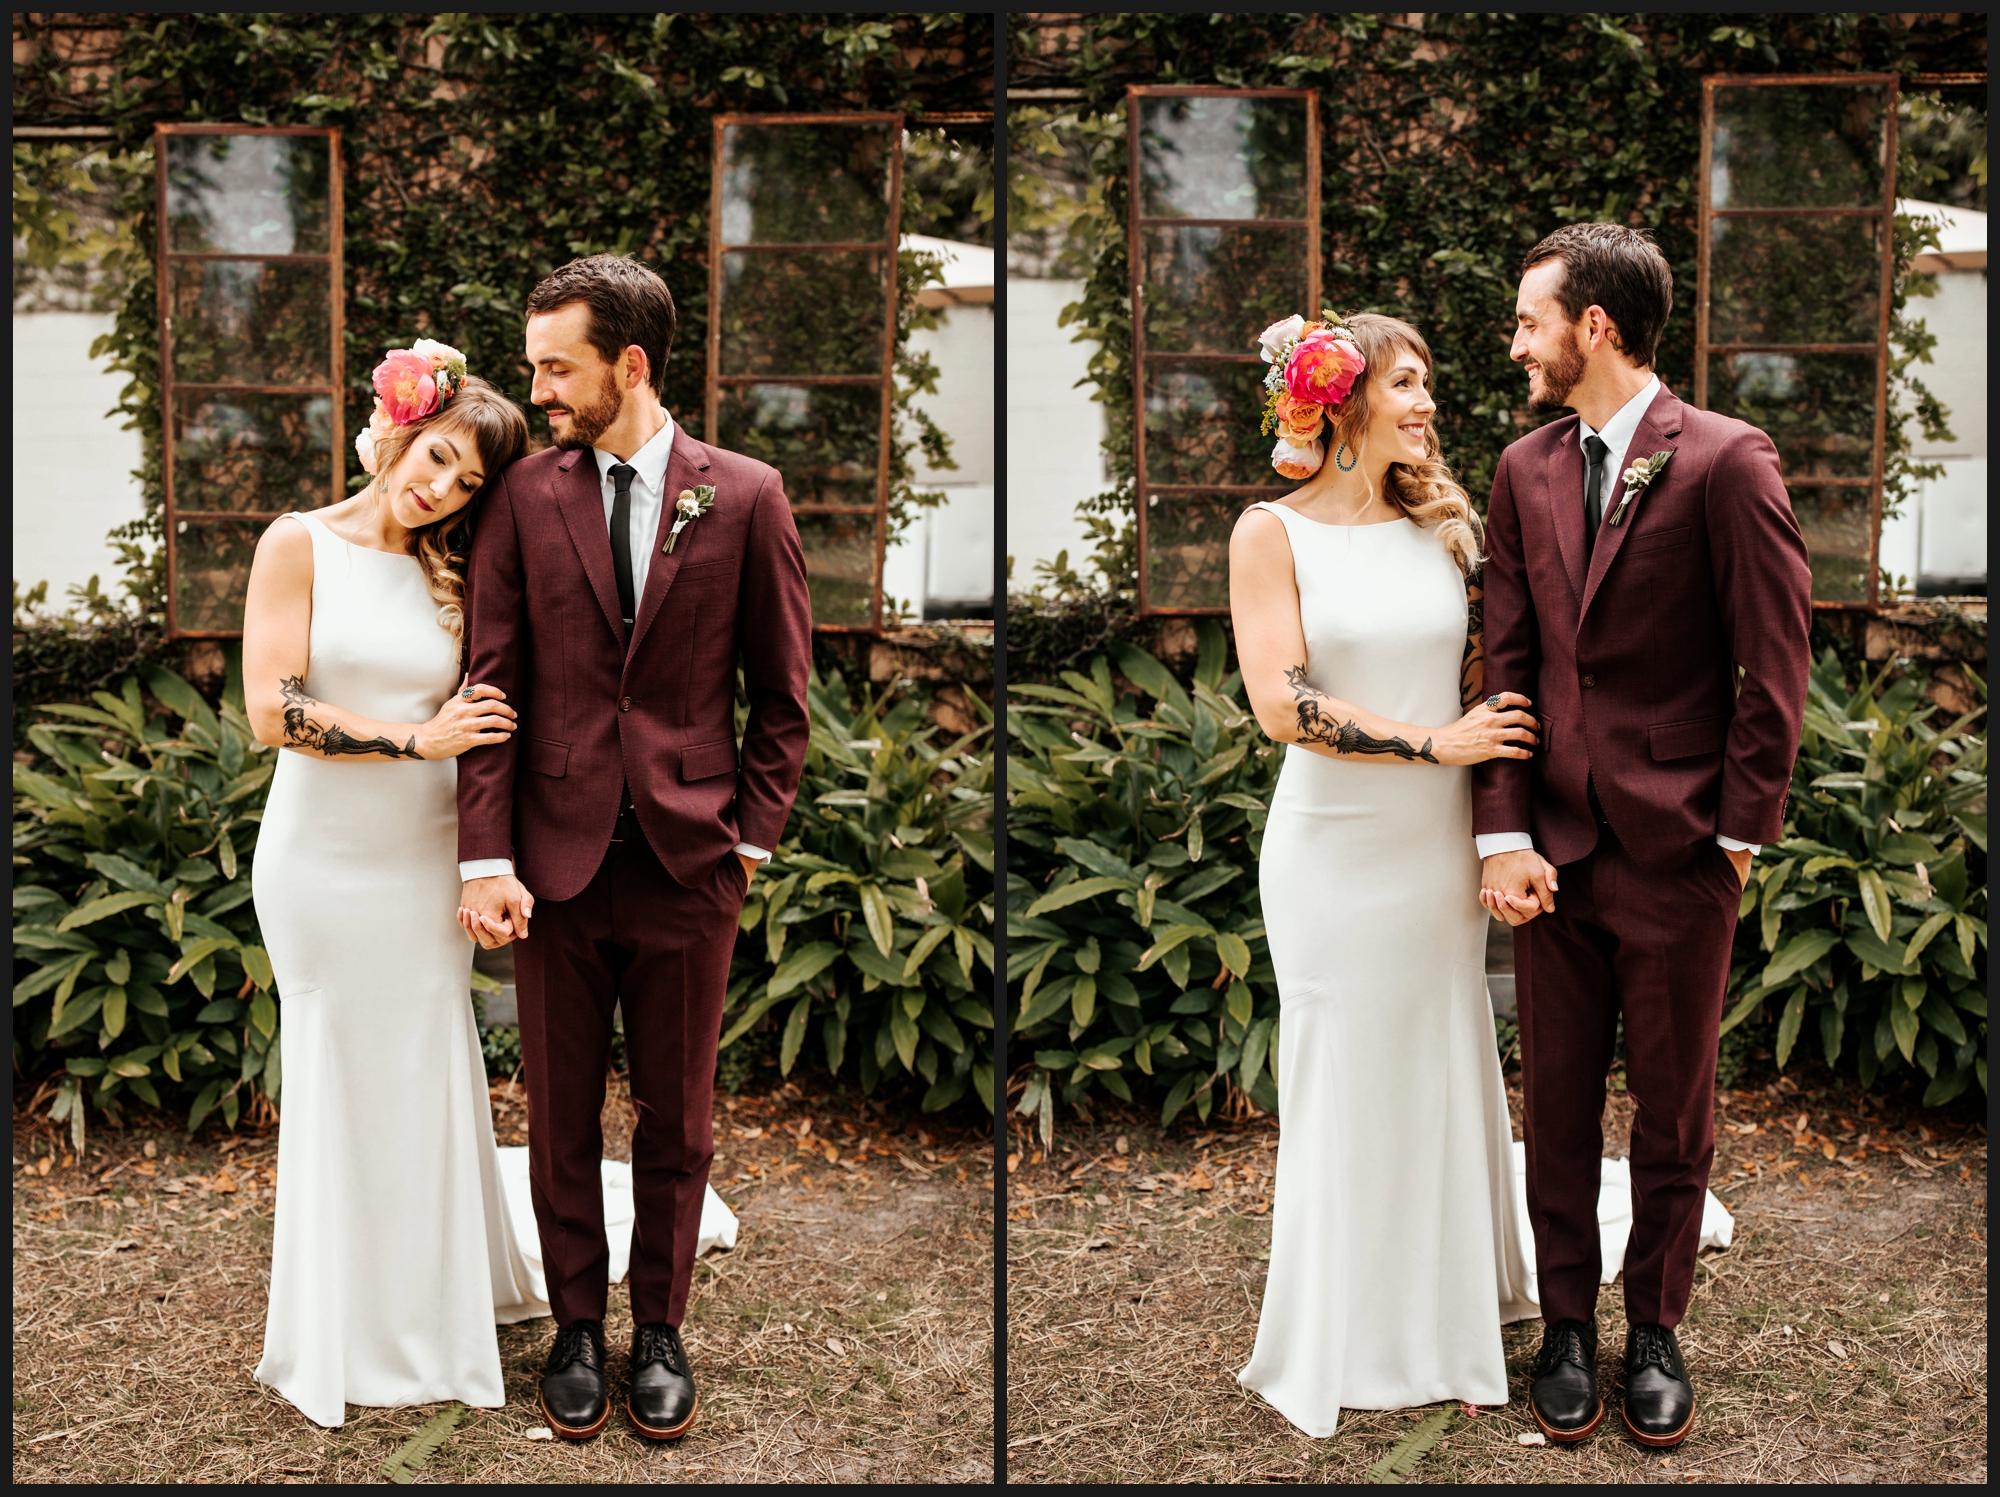 Orlando-Wedding-Photographer-destination-wedding-photographer-florida-wedding-photographer-bohemian-wedding-photographer_1946.jpg